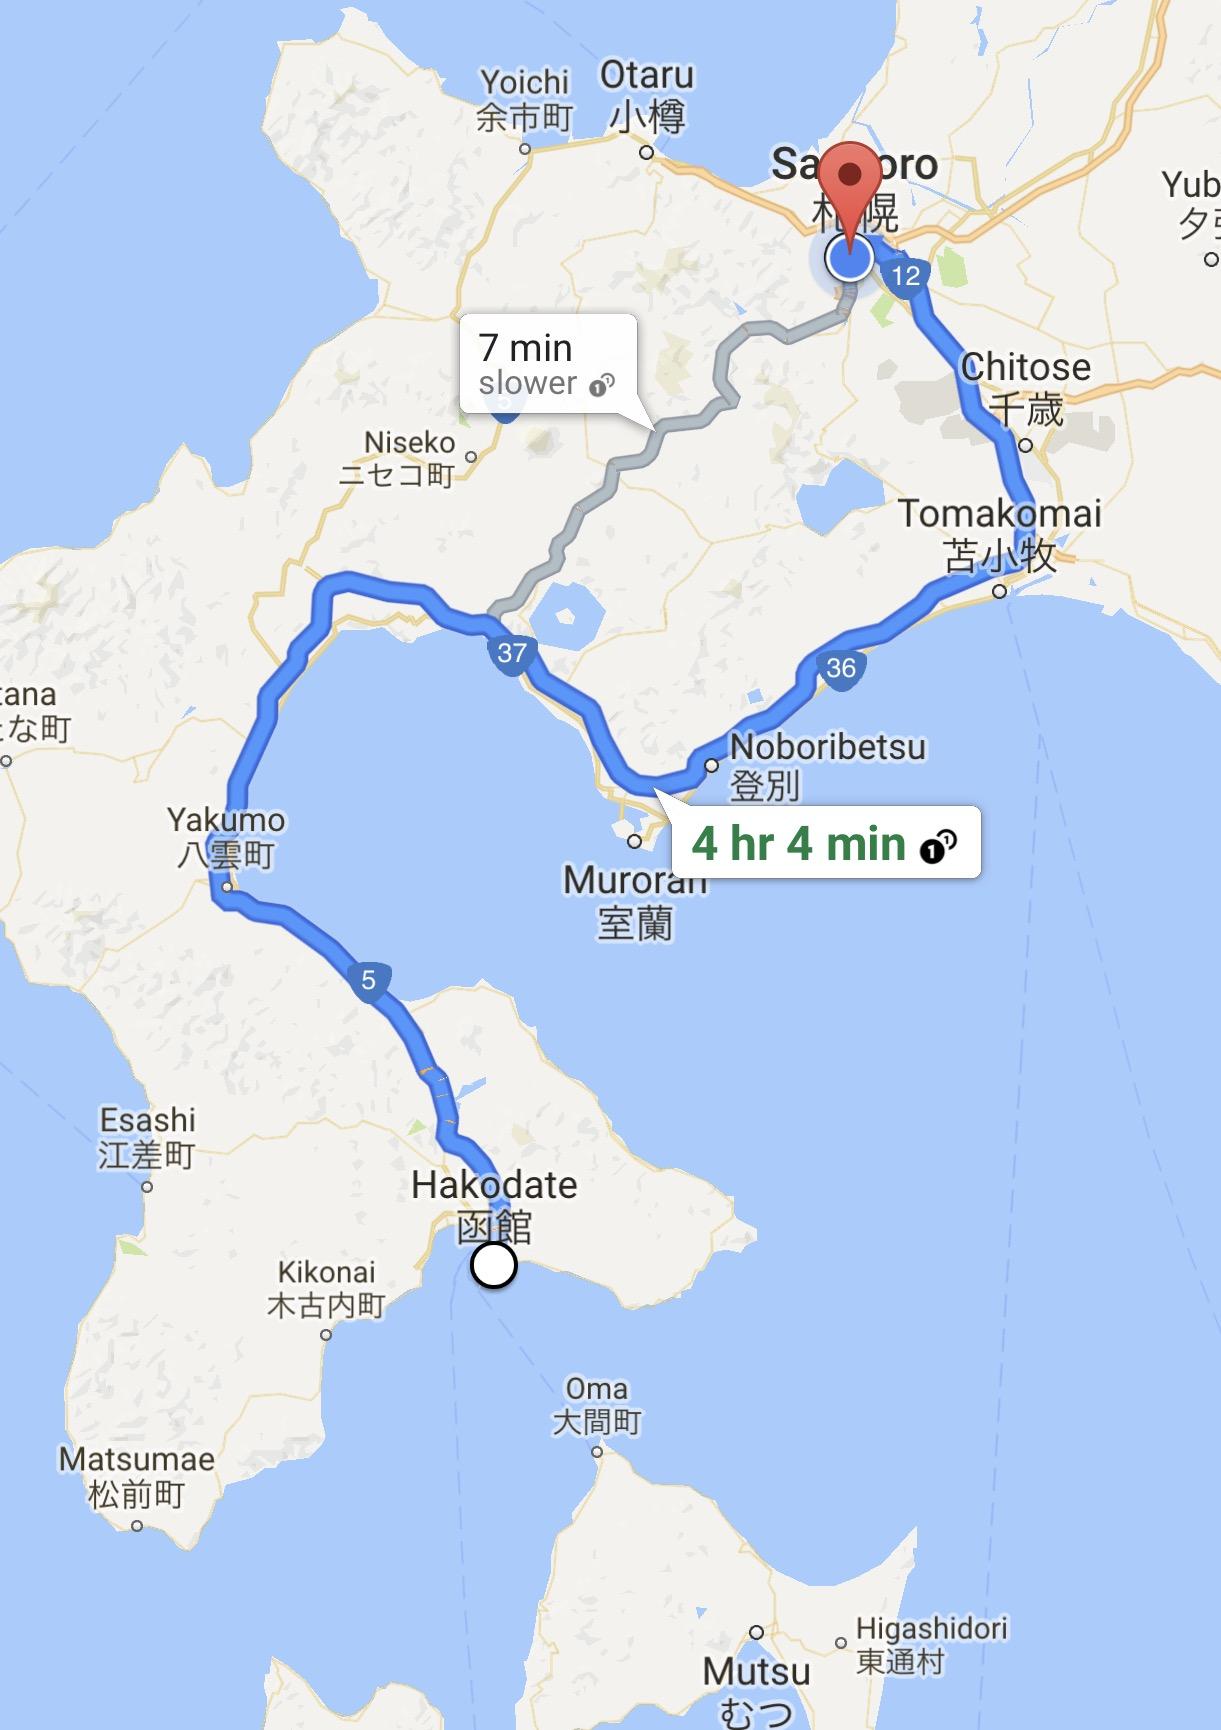 Day six trip to Sapporo